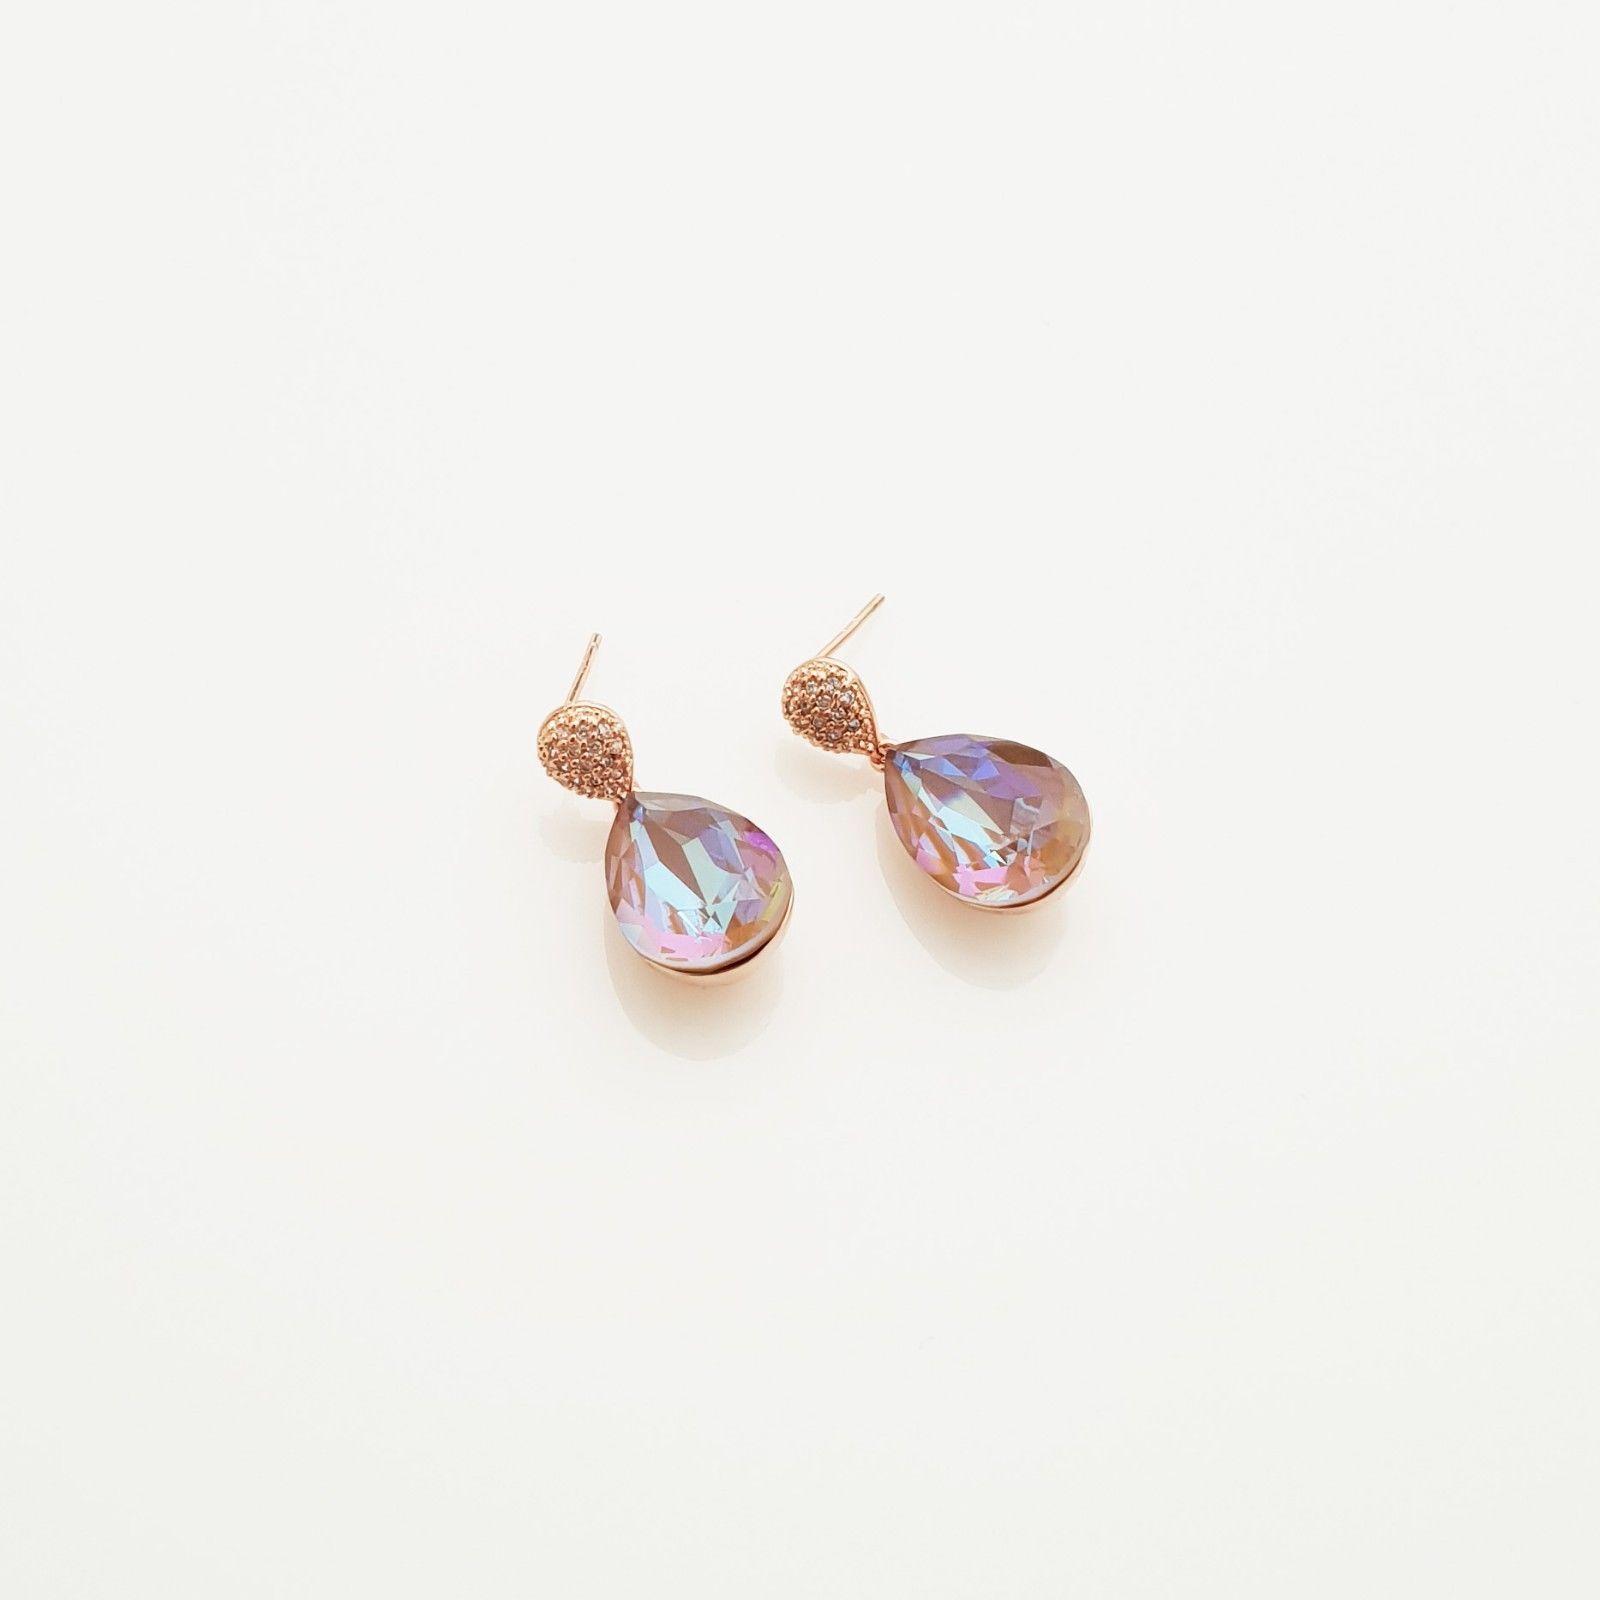 Water Drop Aurora Borealis Made With Swarovski Stone Dangle Earrings 925 Silver image 5